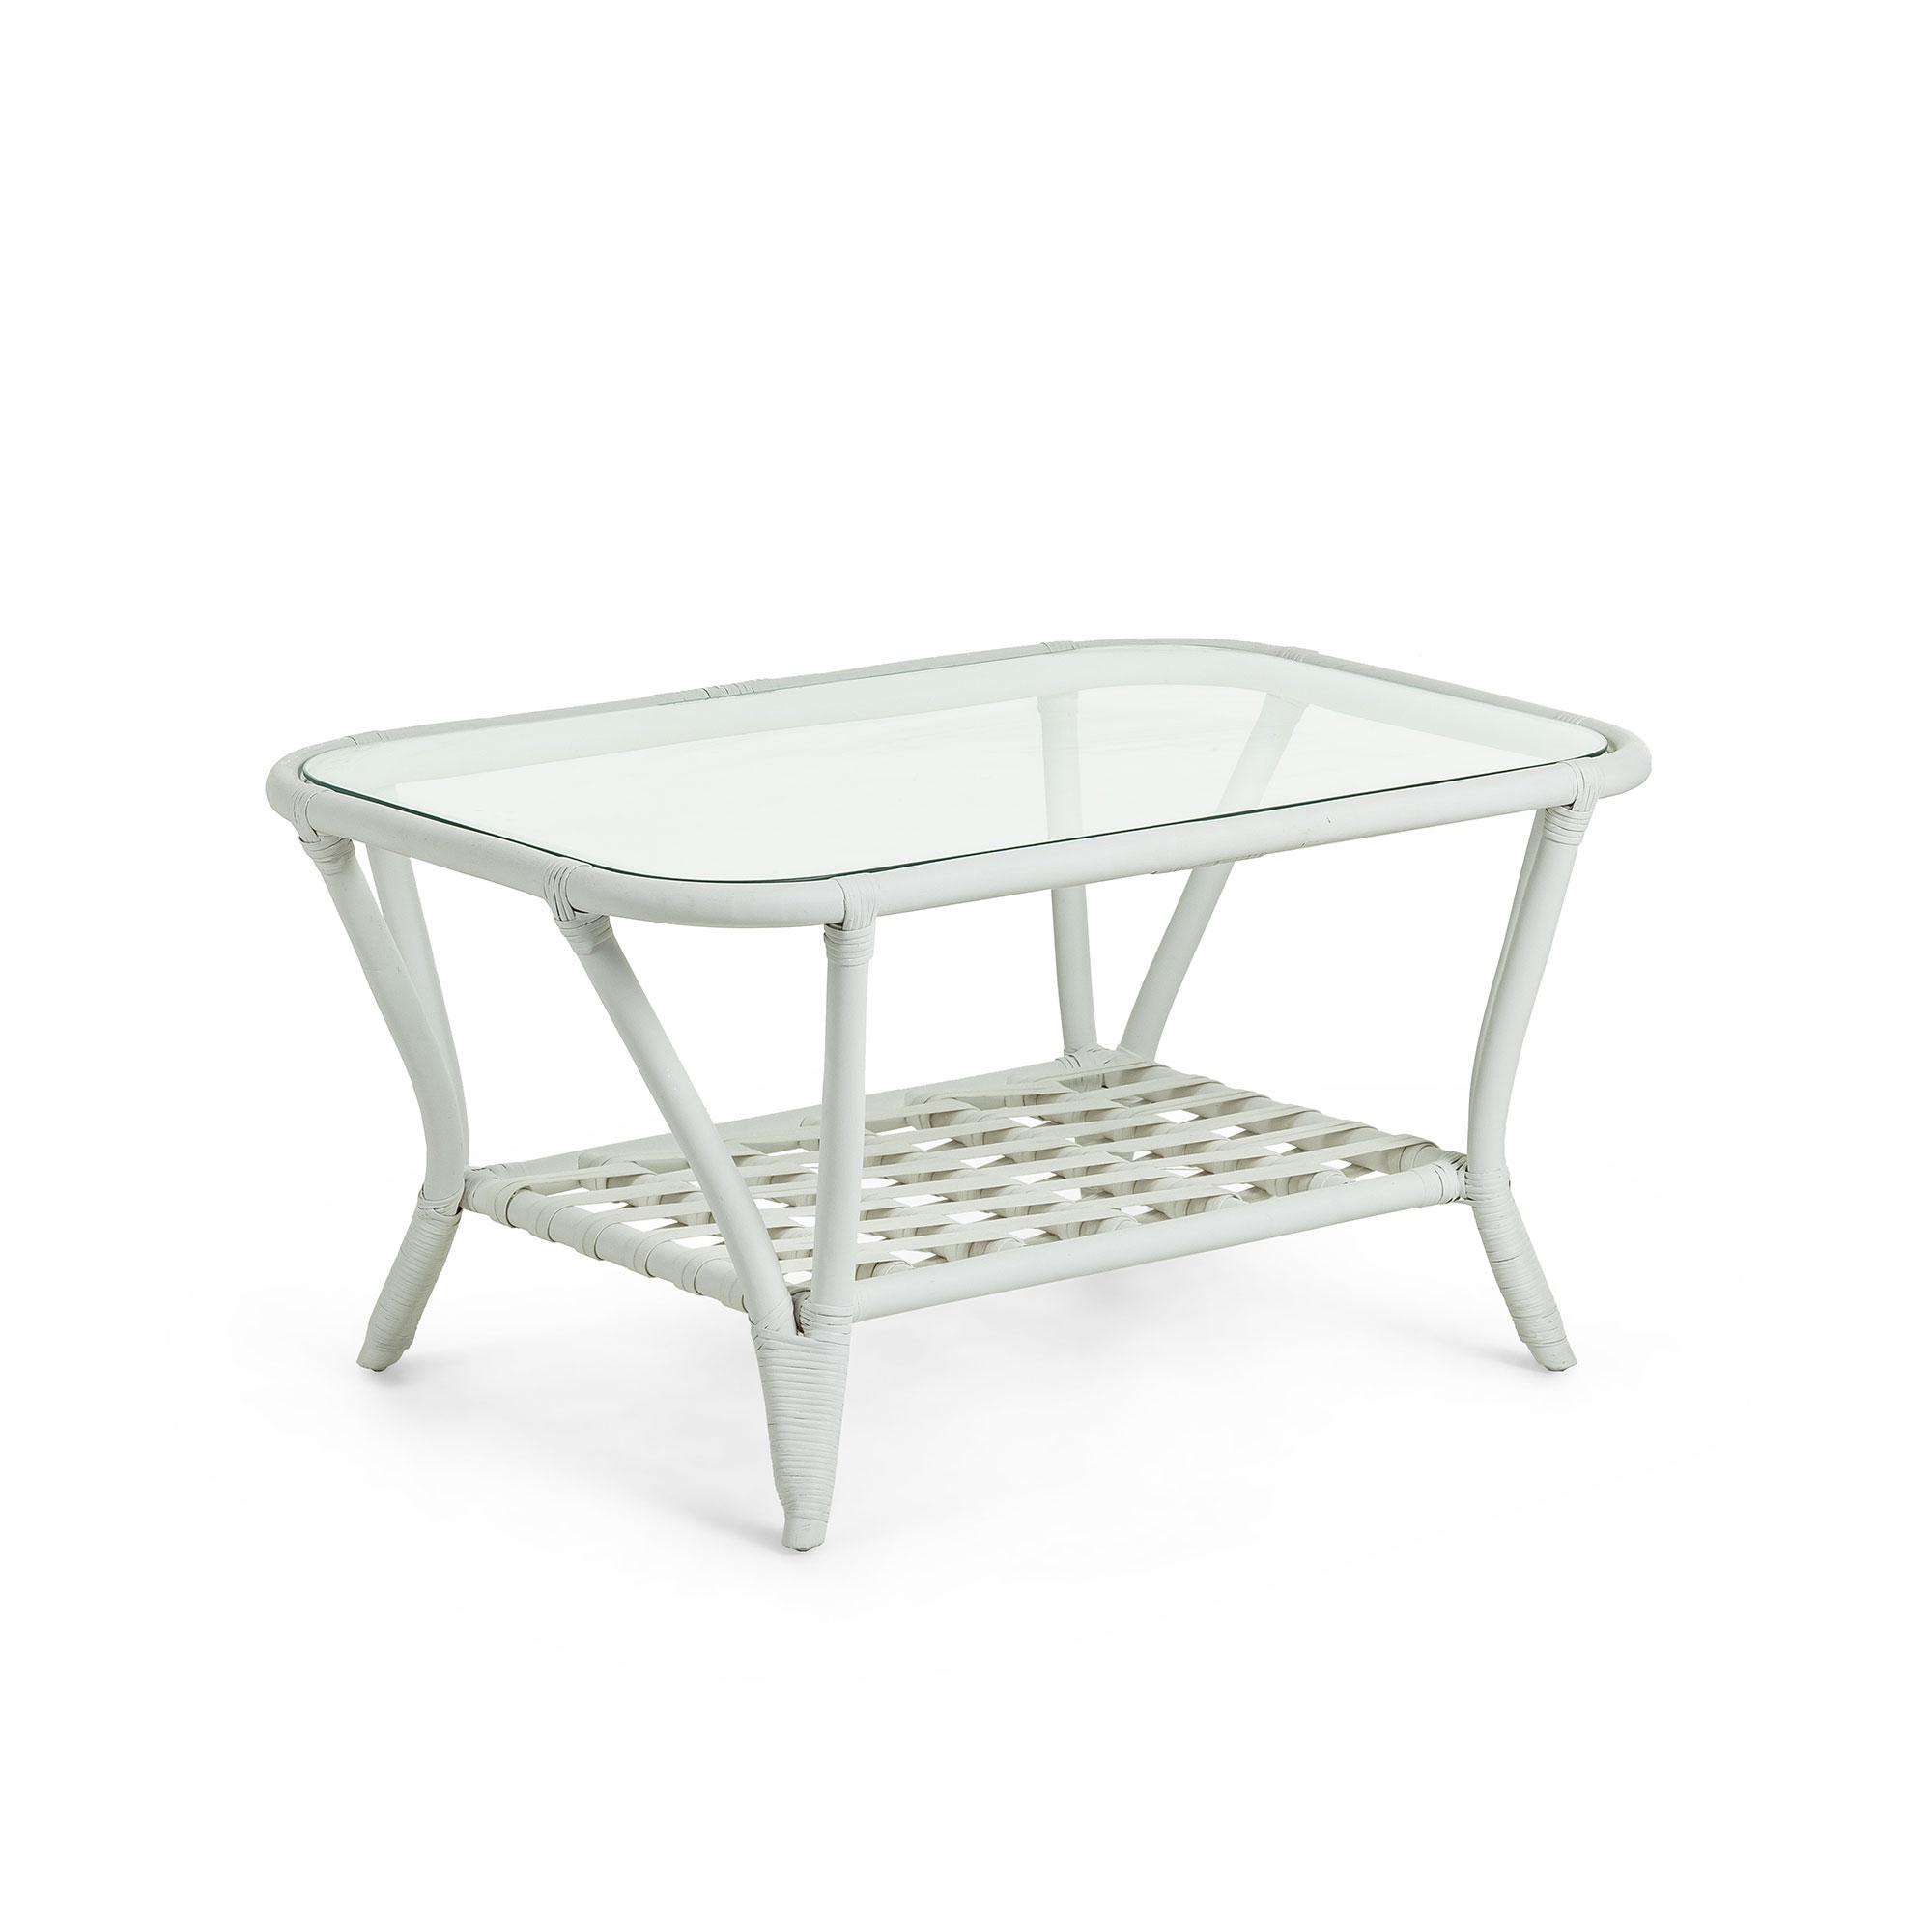 laforma Laforma crampton sofabord - hvid/klar rattan/glas, m. hylde, rektangulær (90x60) på boboonline.dk